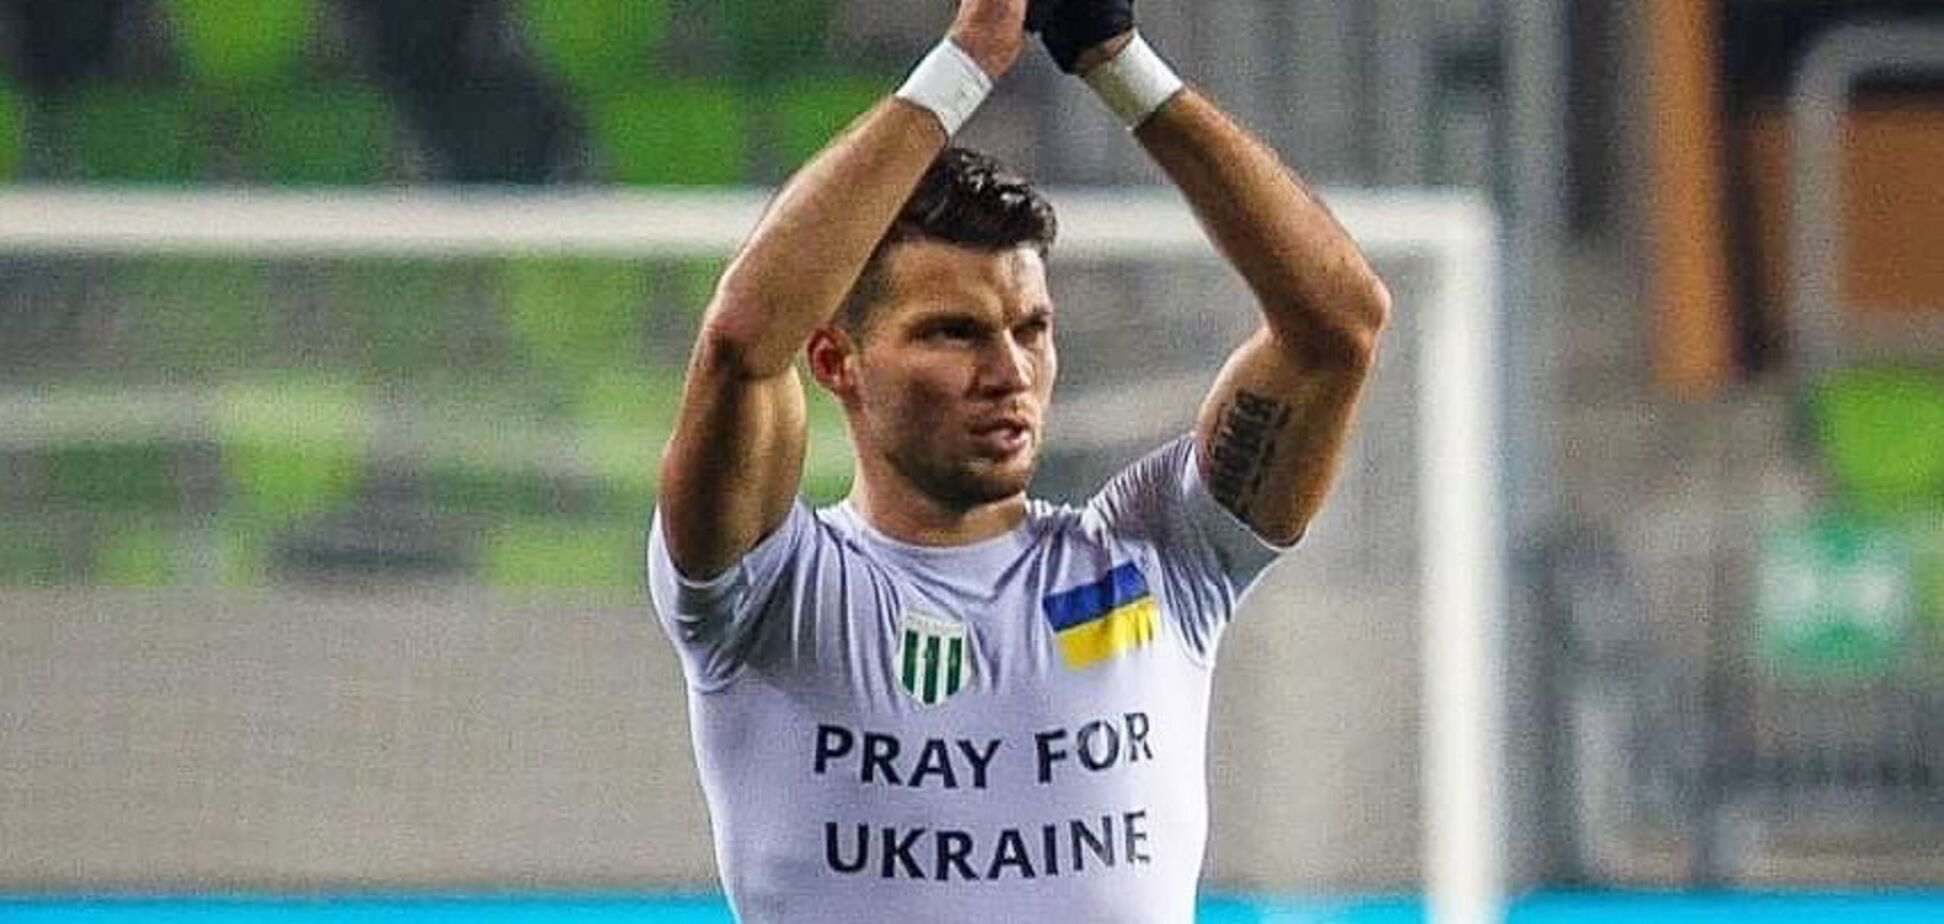 ''Pray for Ukraine'': футболист наплевал на запрет и поддержал Украину